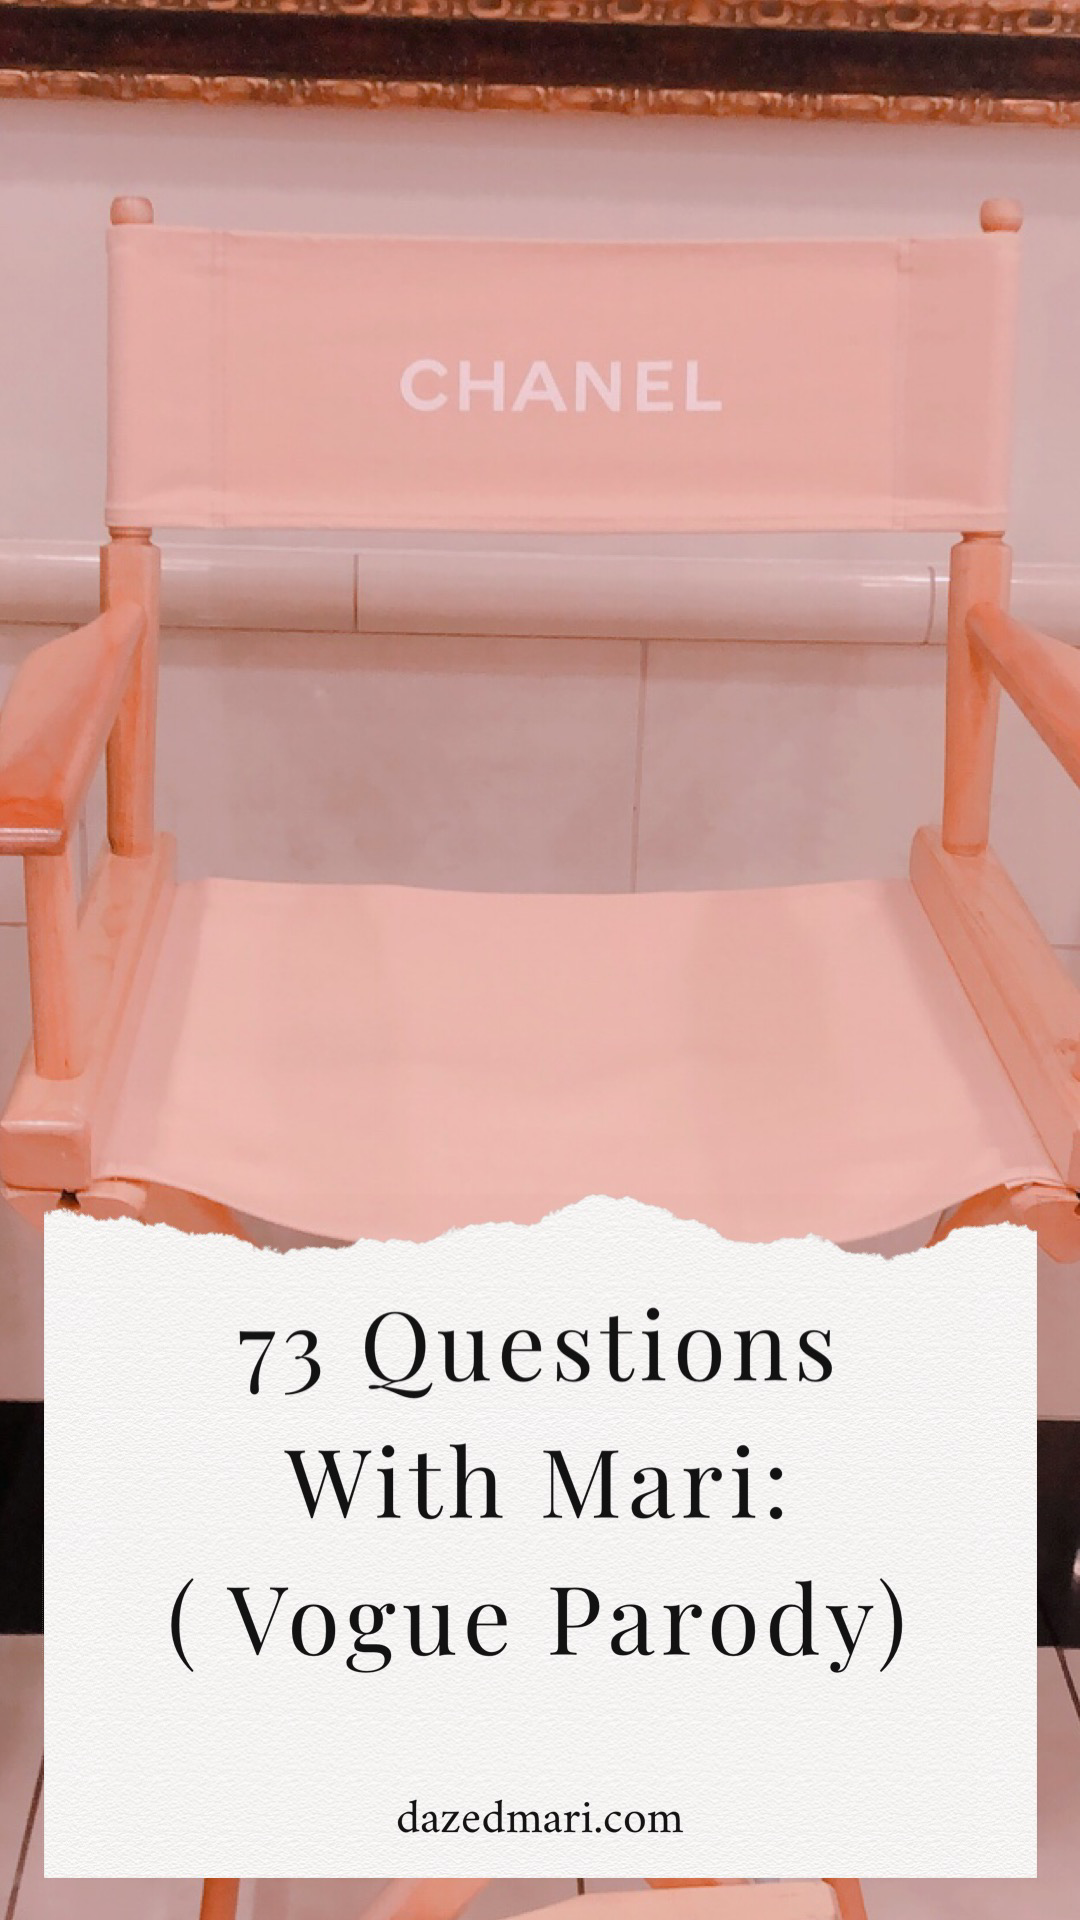 Vogue Parody, Vogue, 73 Questions